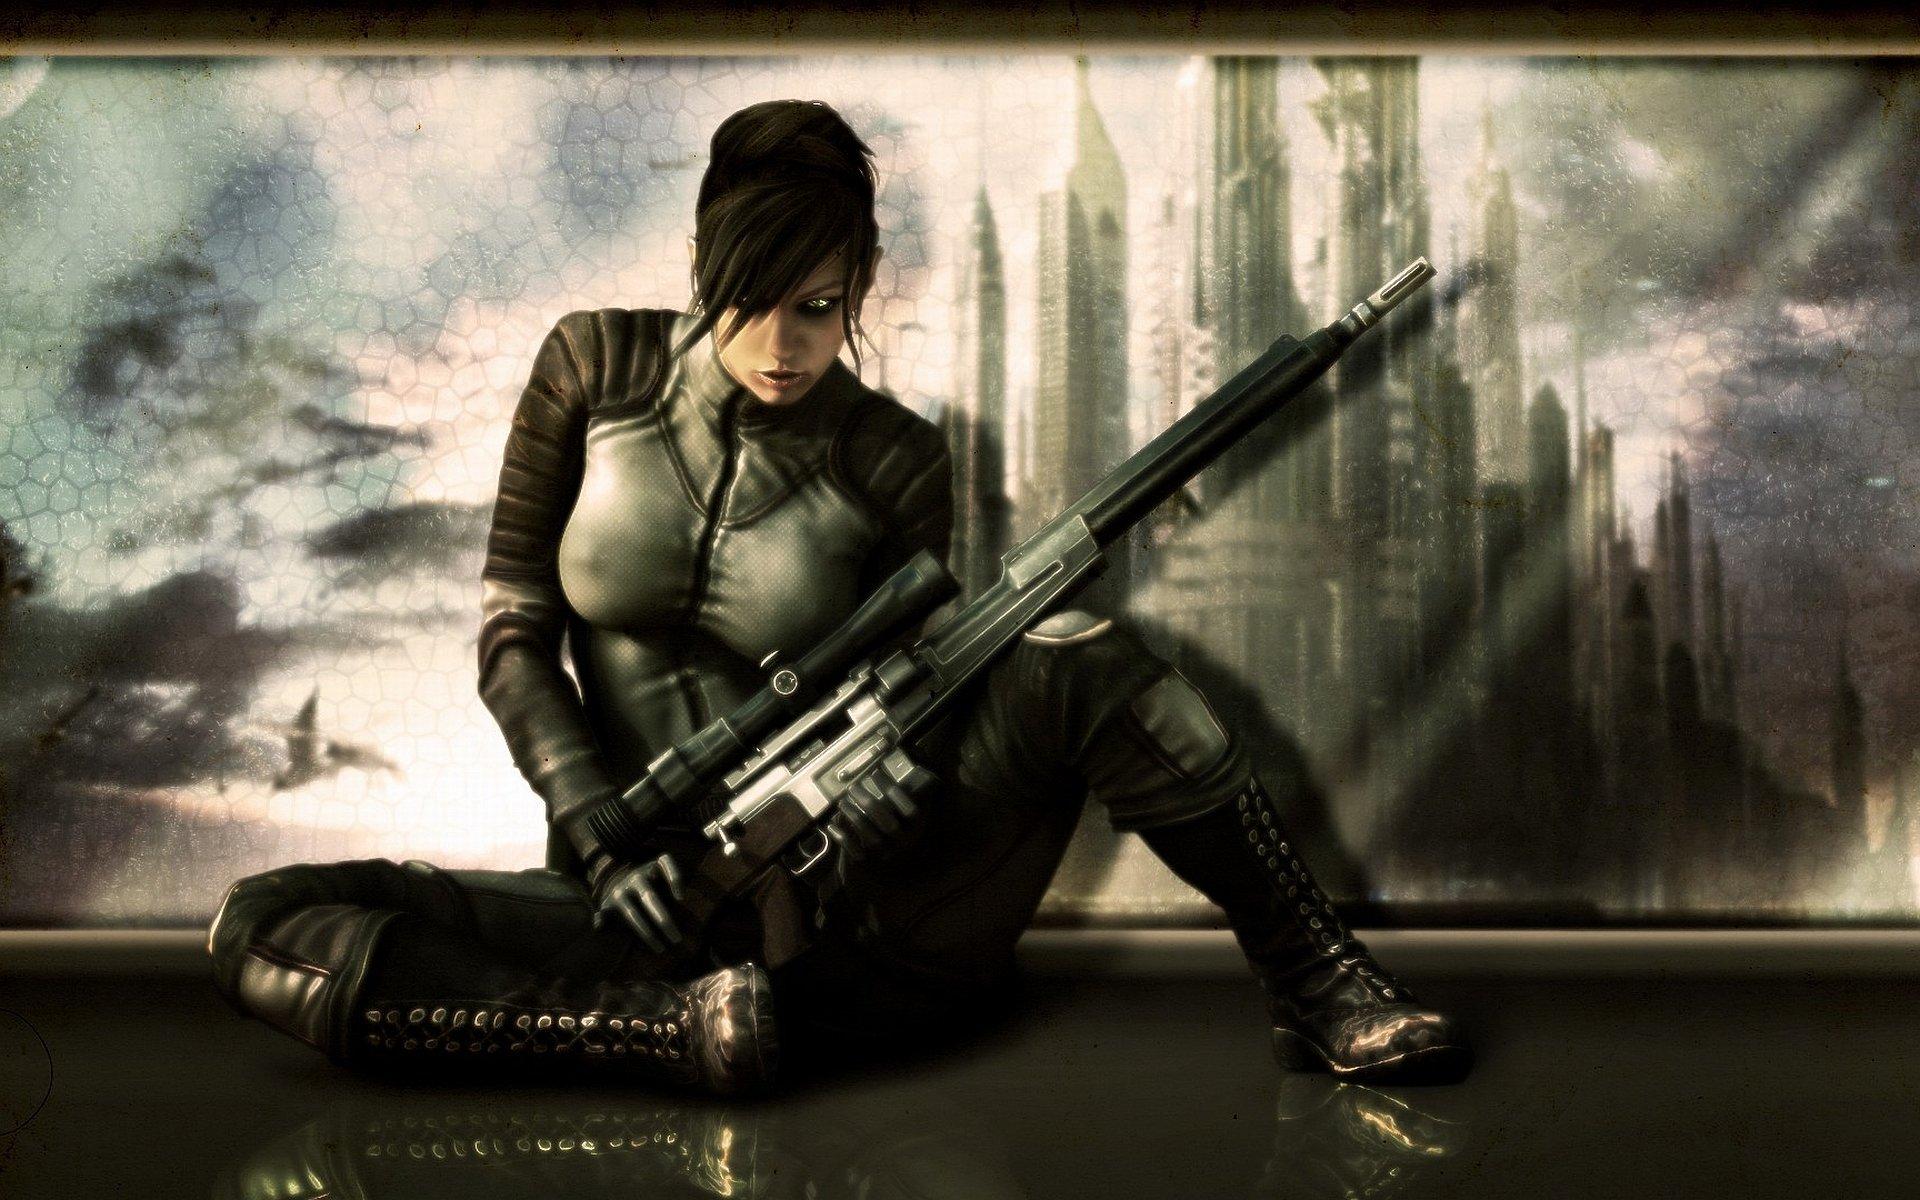 download wallpaper female warrior - photo #37